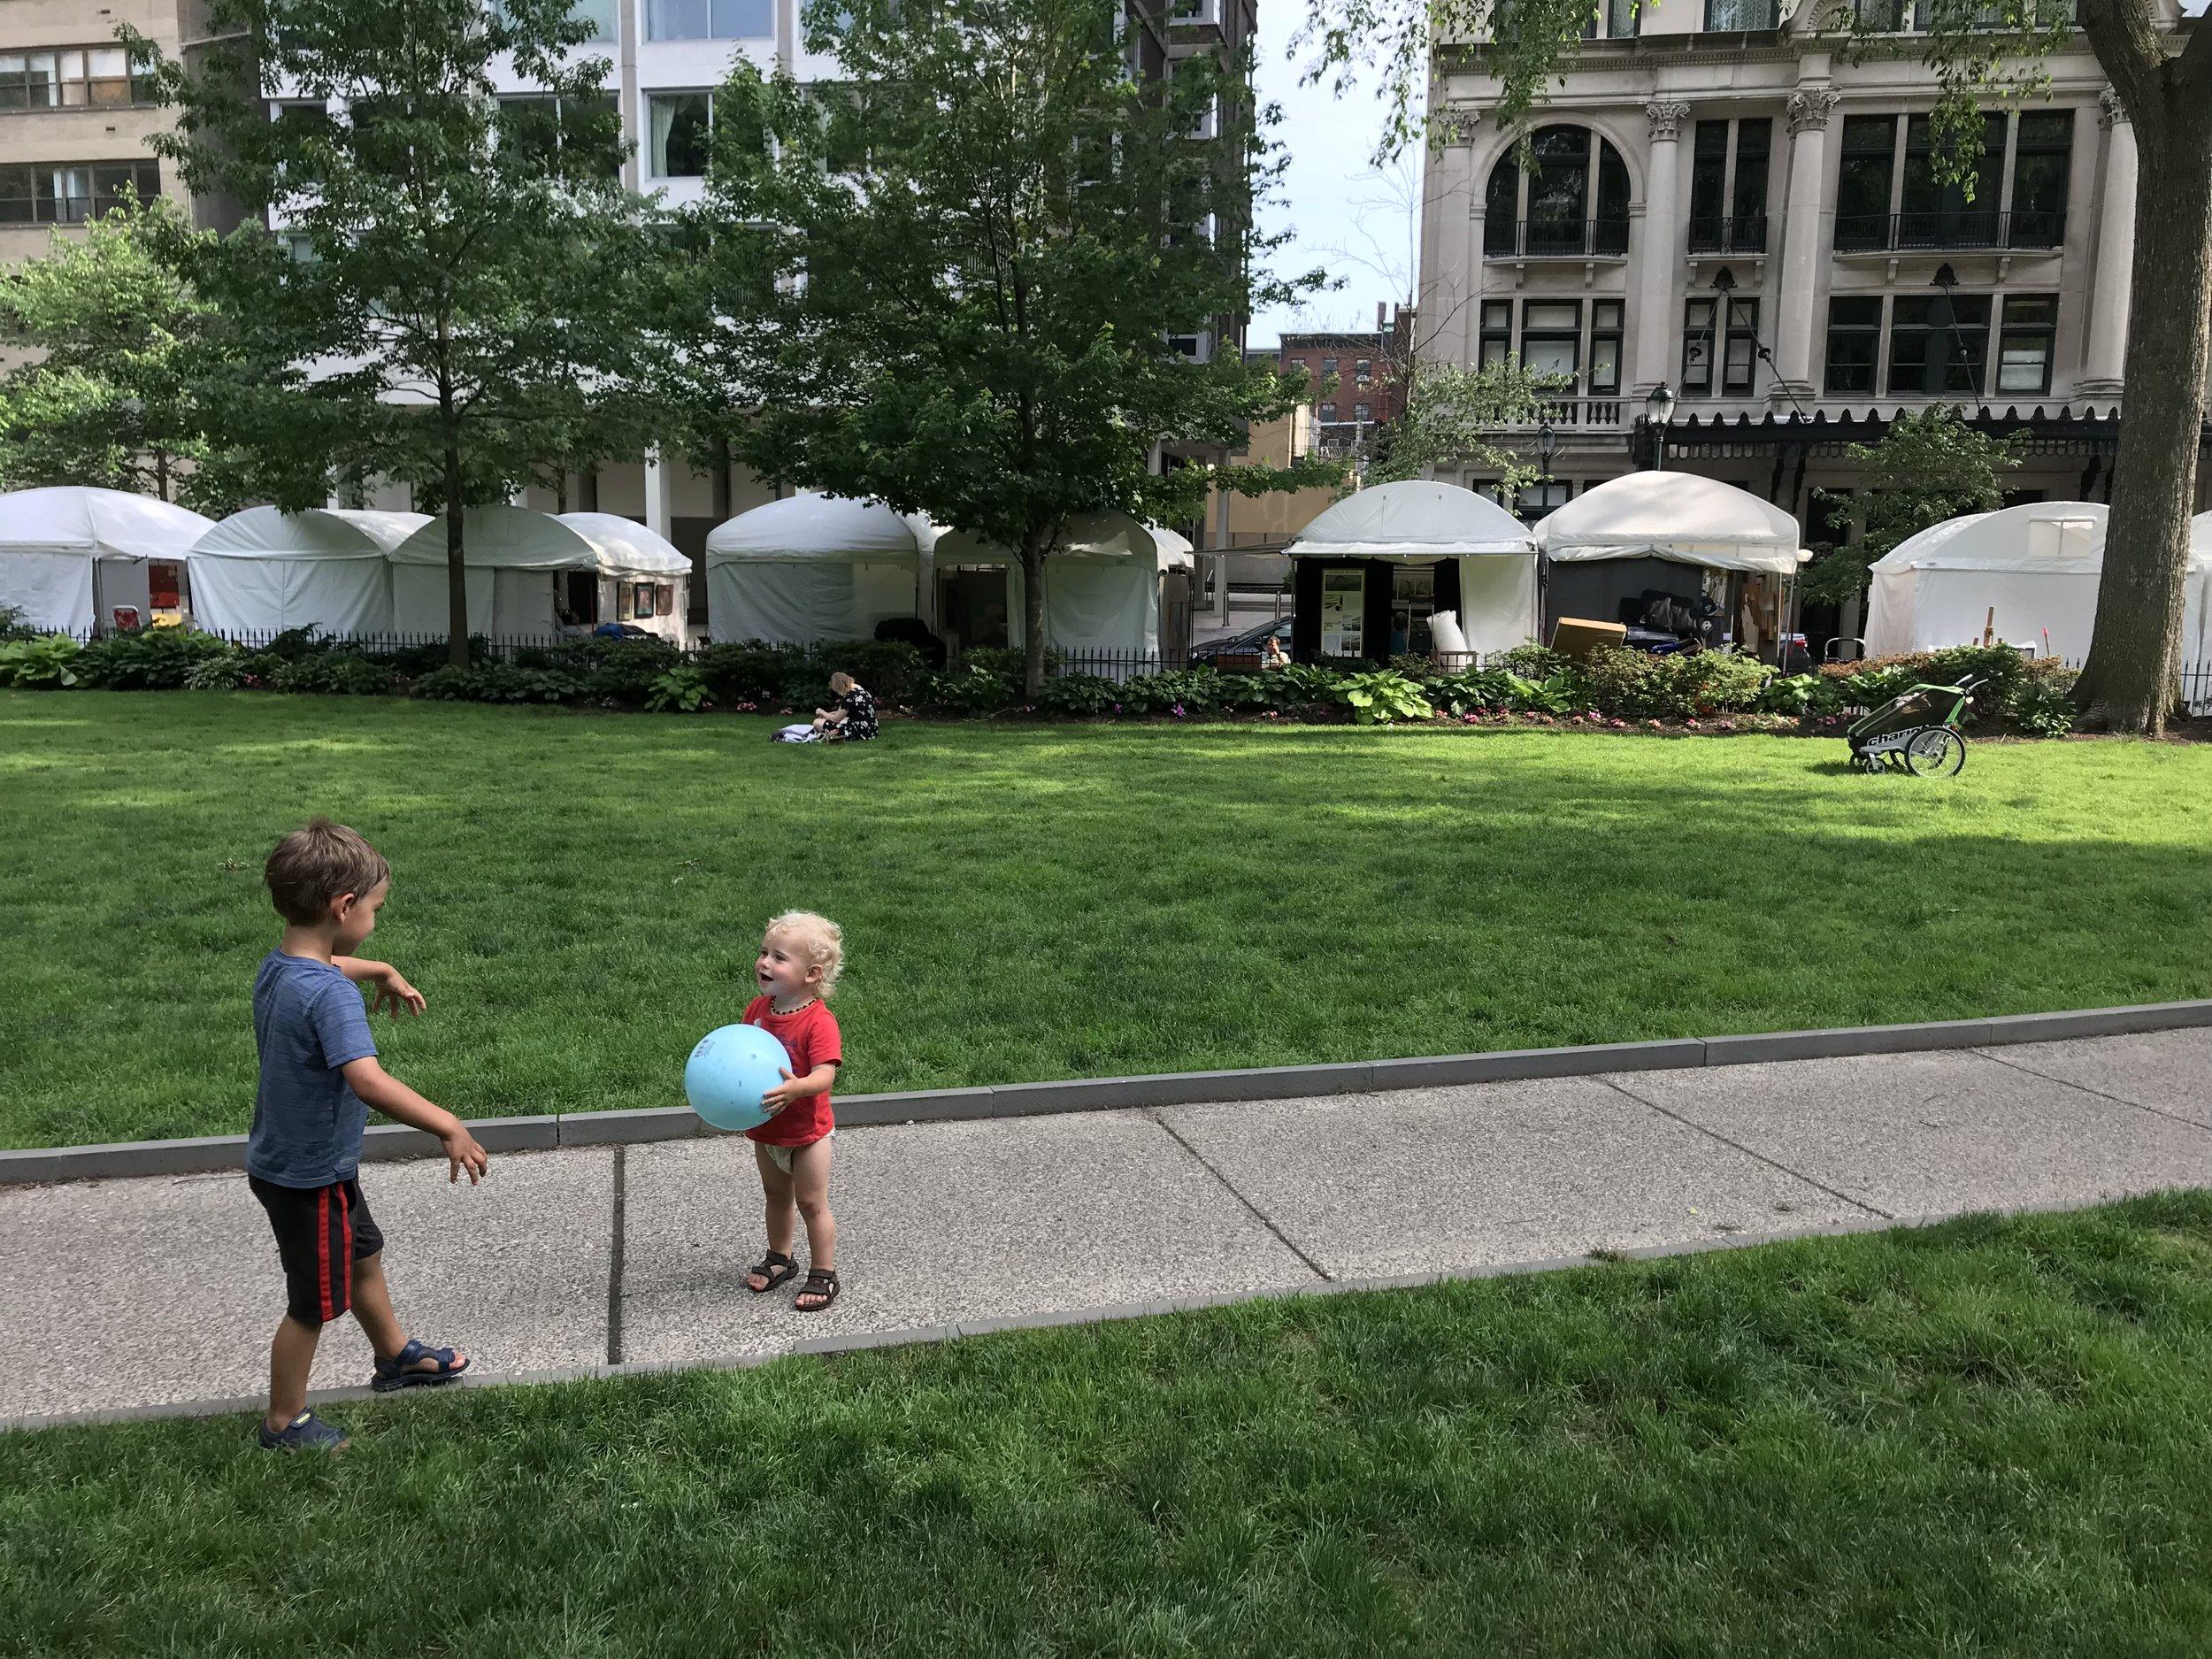 Festival babies   Philadelphia, PA   June